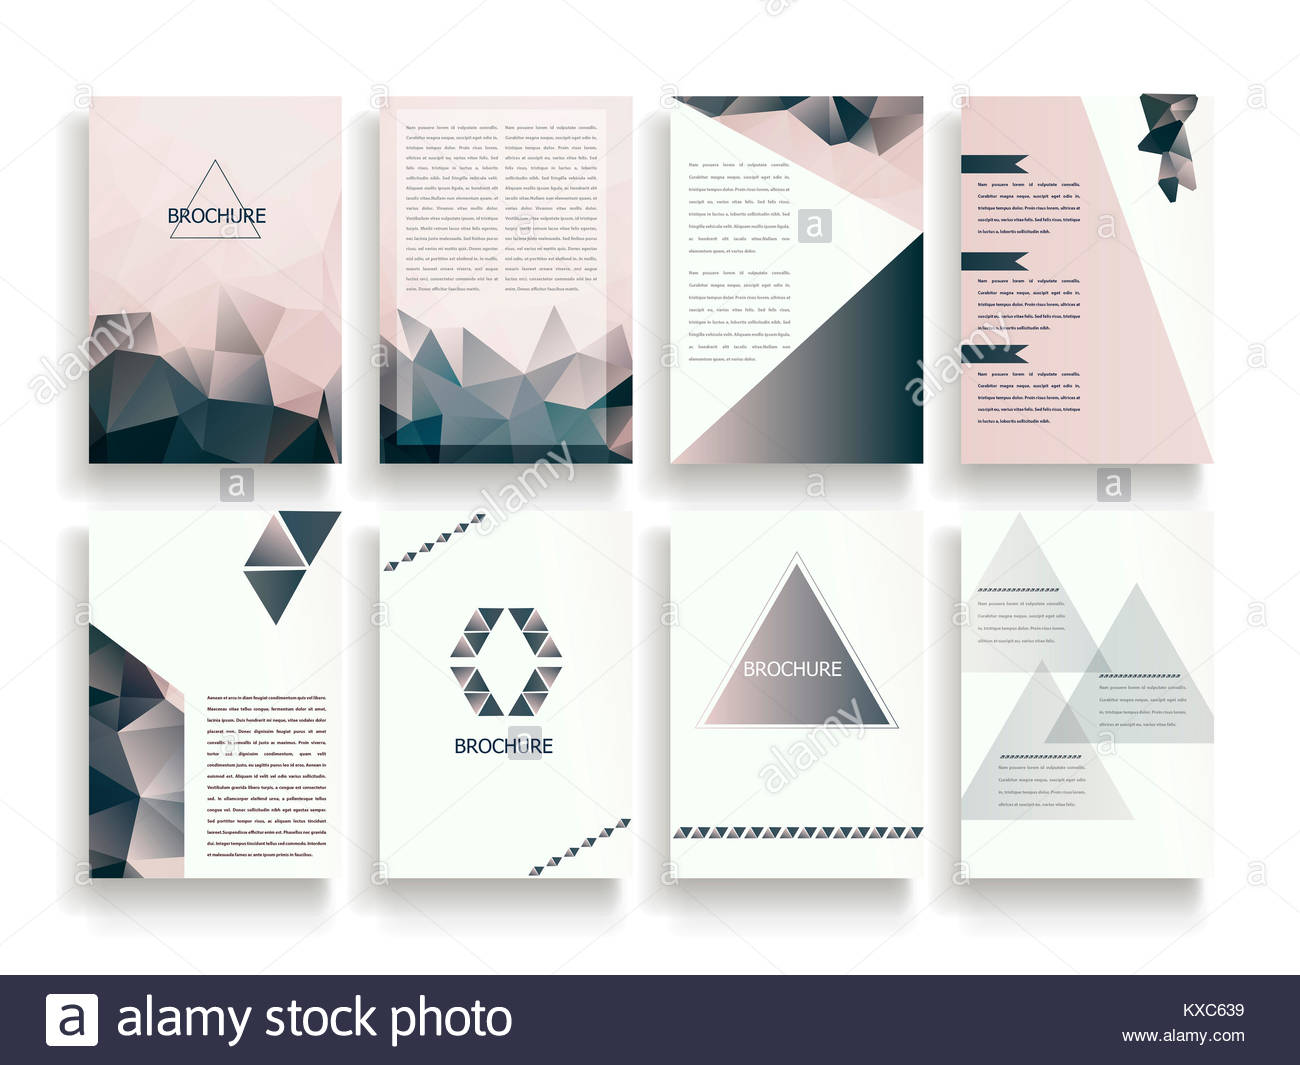 Elegant Brochure Template Design Triangle Stock Photos & Elegant ...